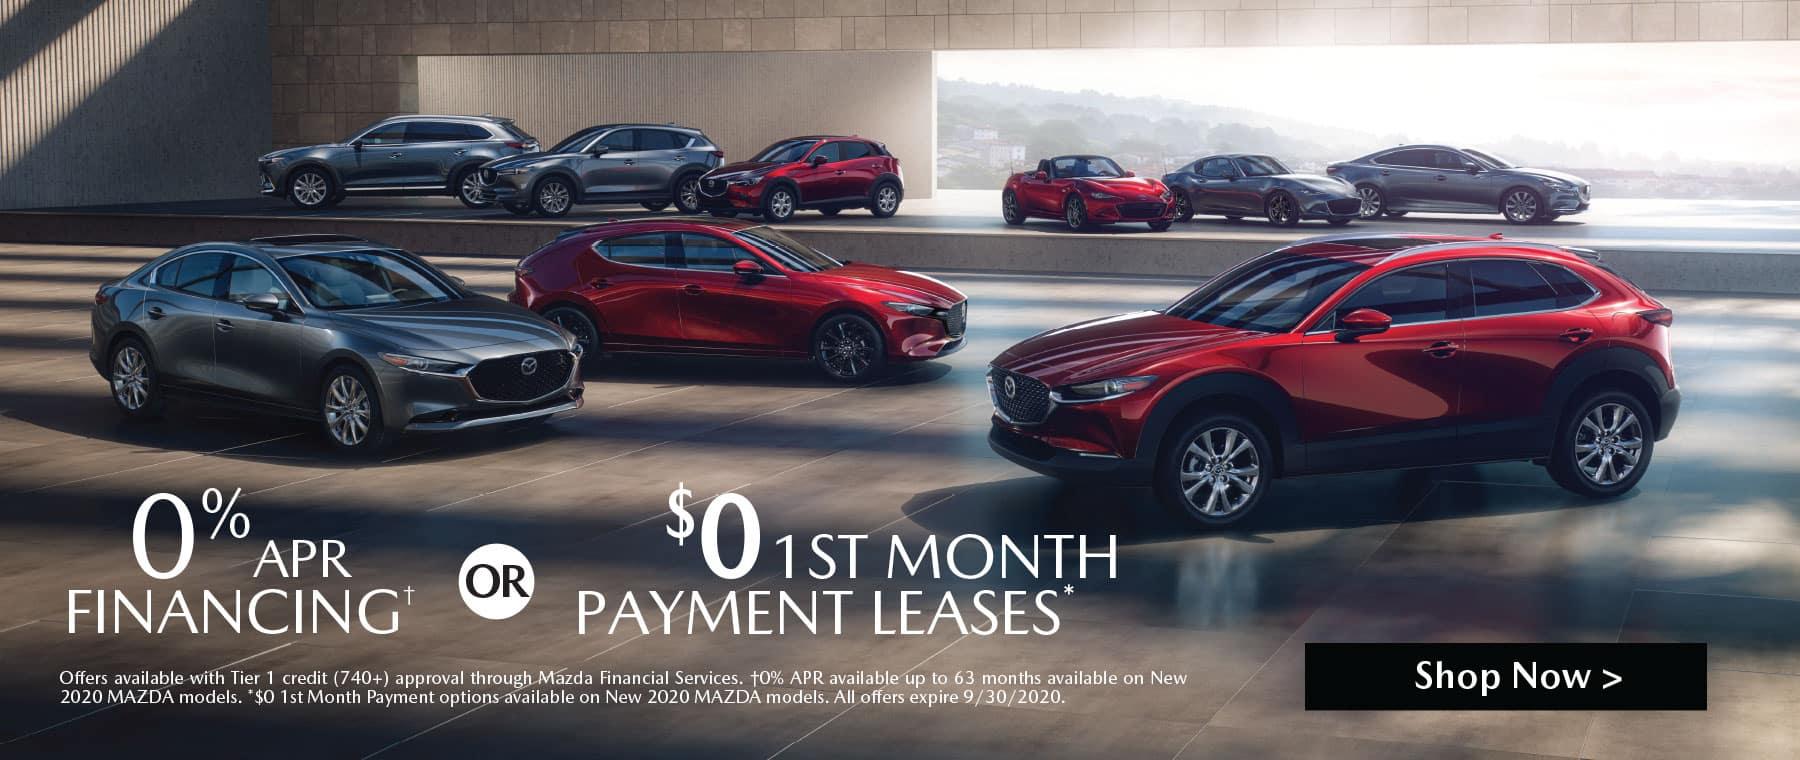 s New APR Special Offer Garden City Mazda NY